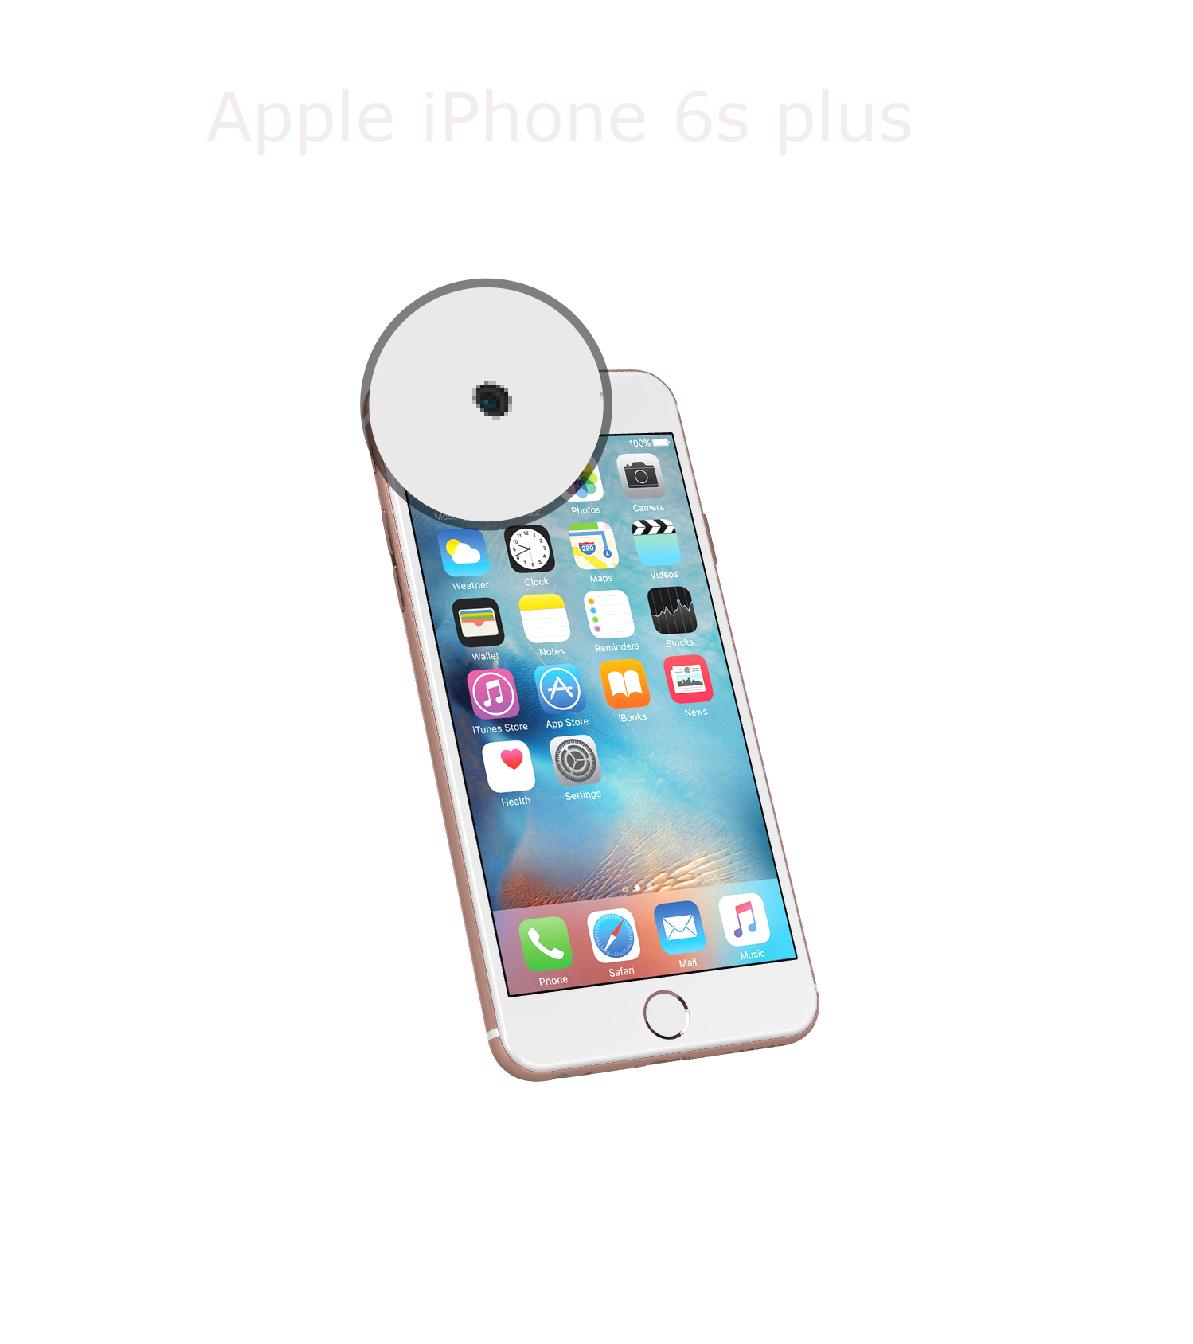 Laga kamera (selfie) iPhone 6s plus